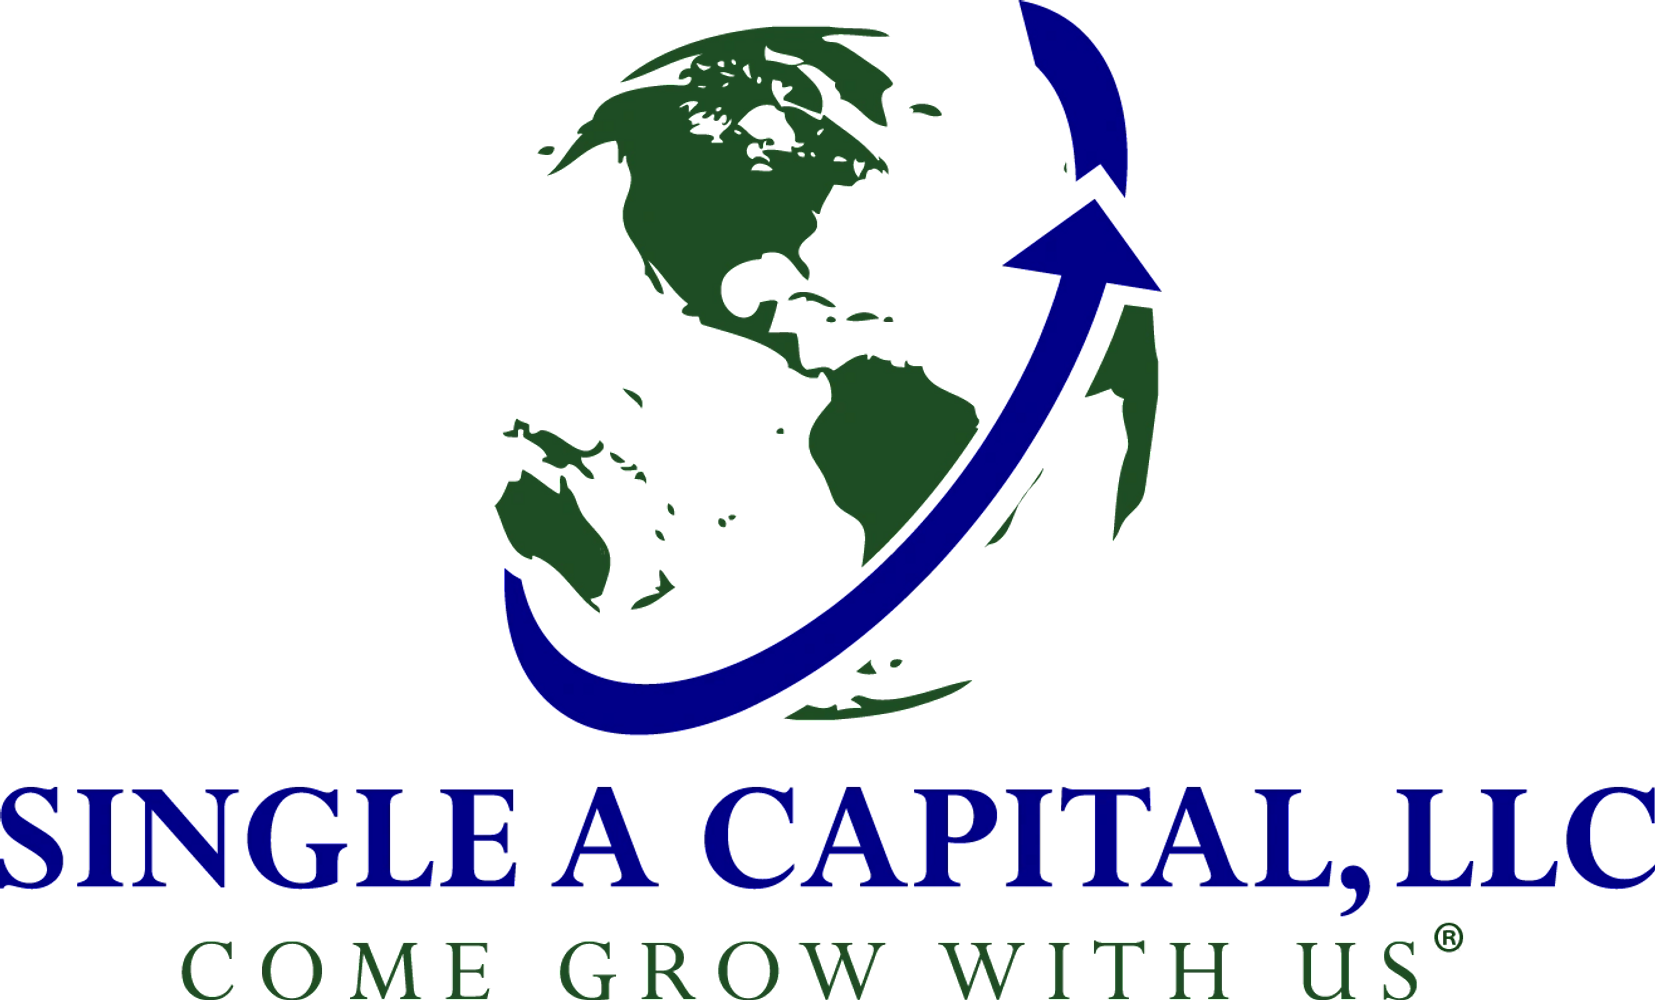 Single A Capital